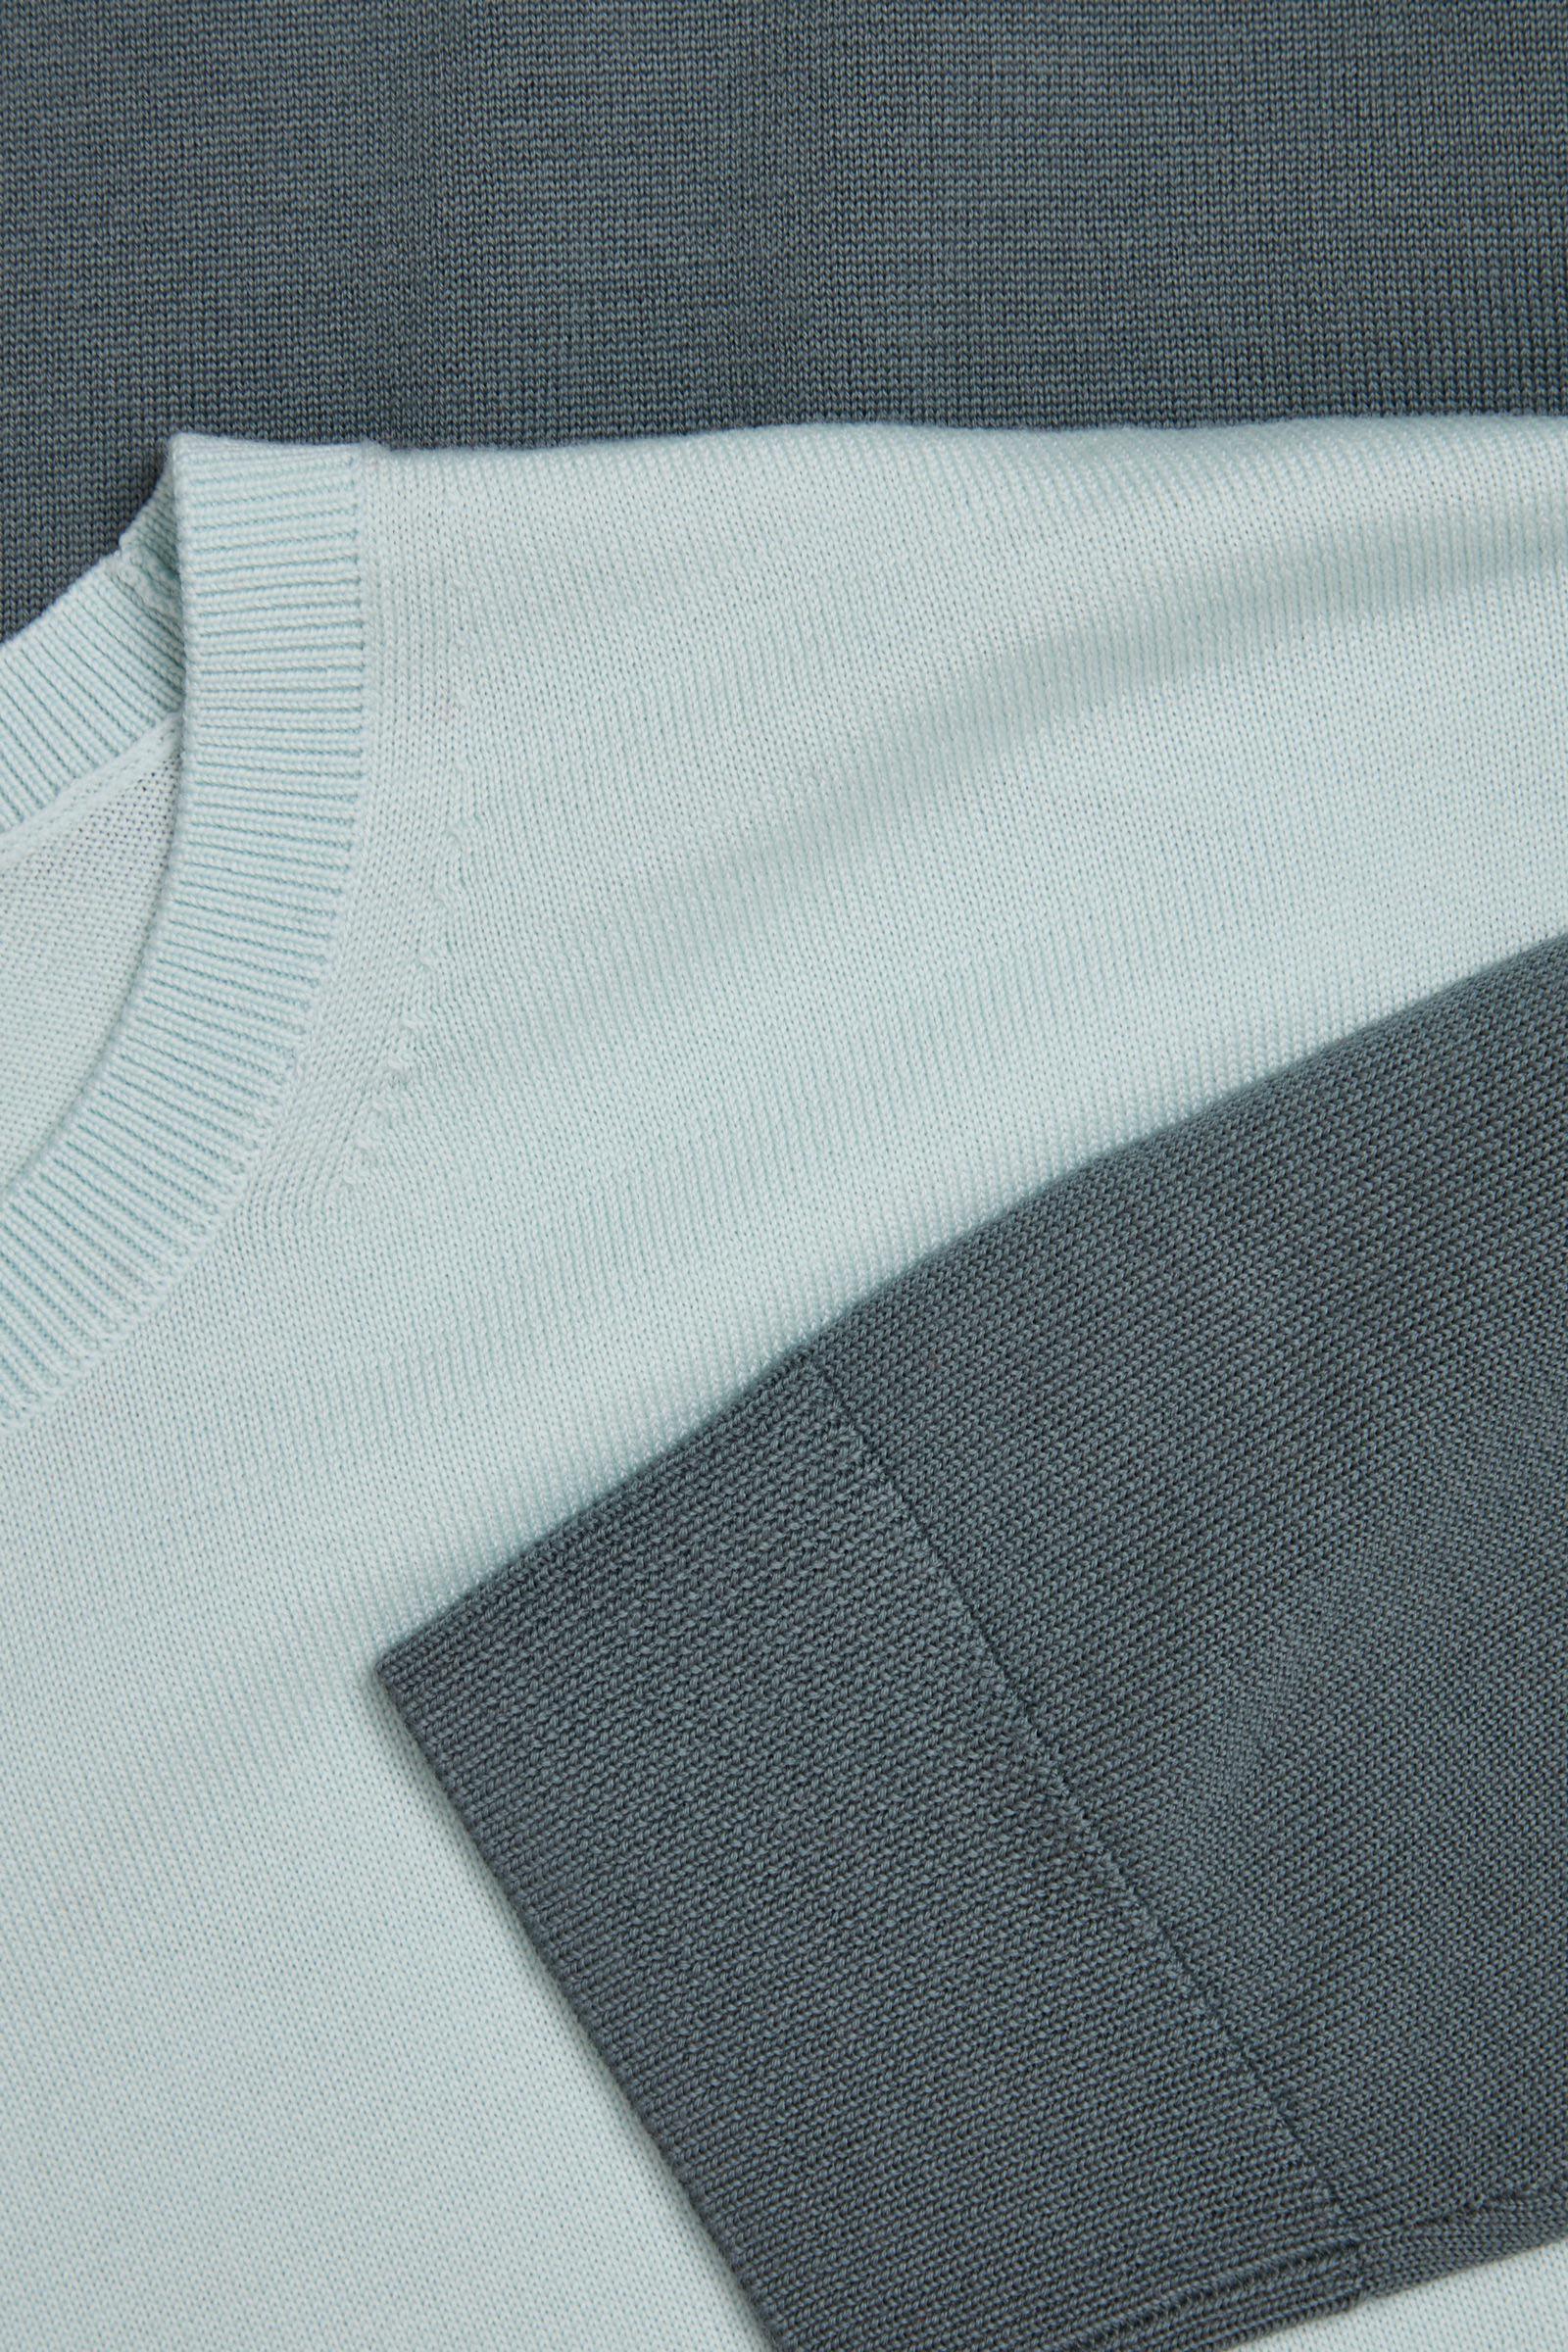 COS 메리노 크루넥 스웨터의 터쿼이즈컬러 Detail입니다.